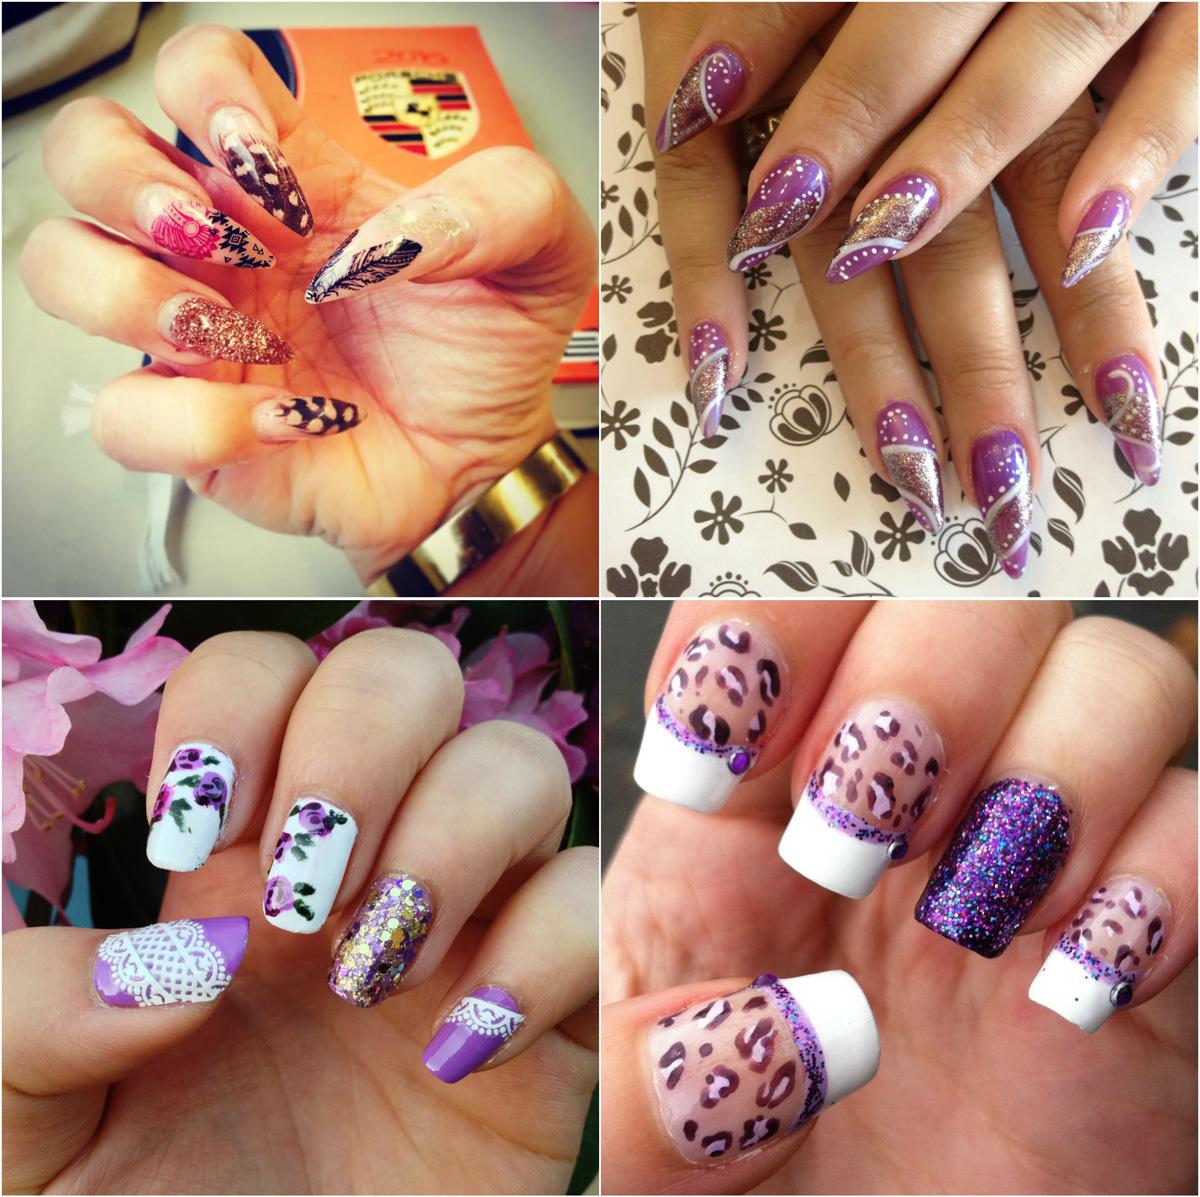 purple-with-white-lace-stiletto-nail-art